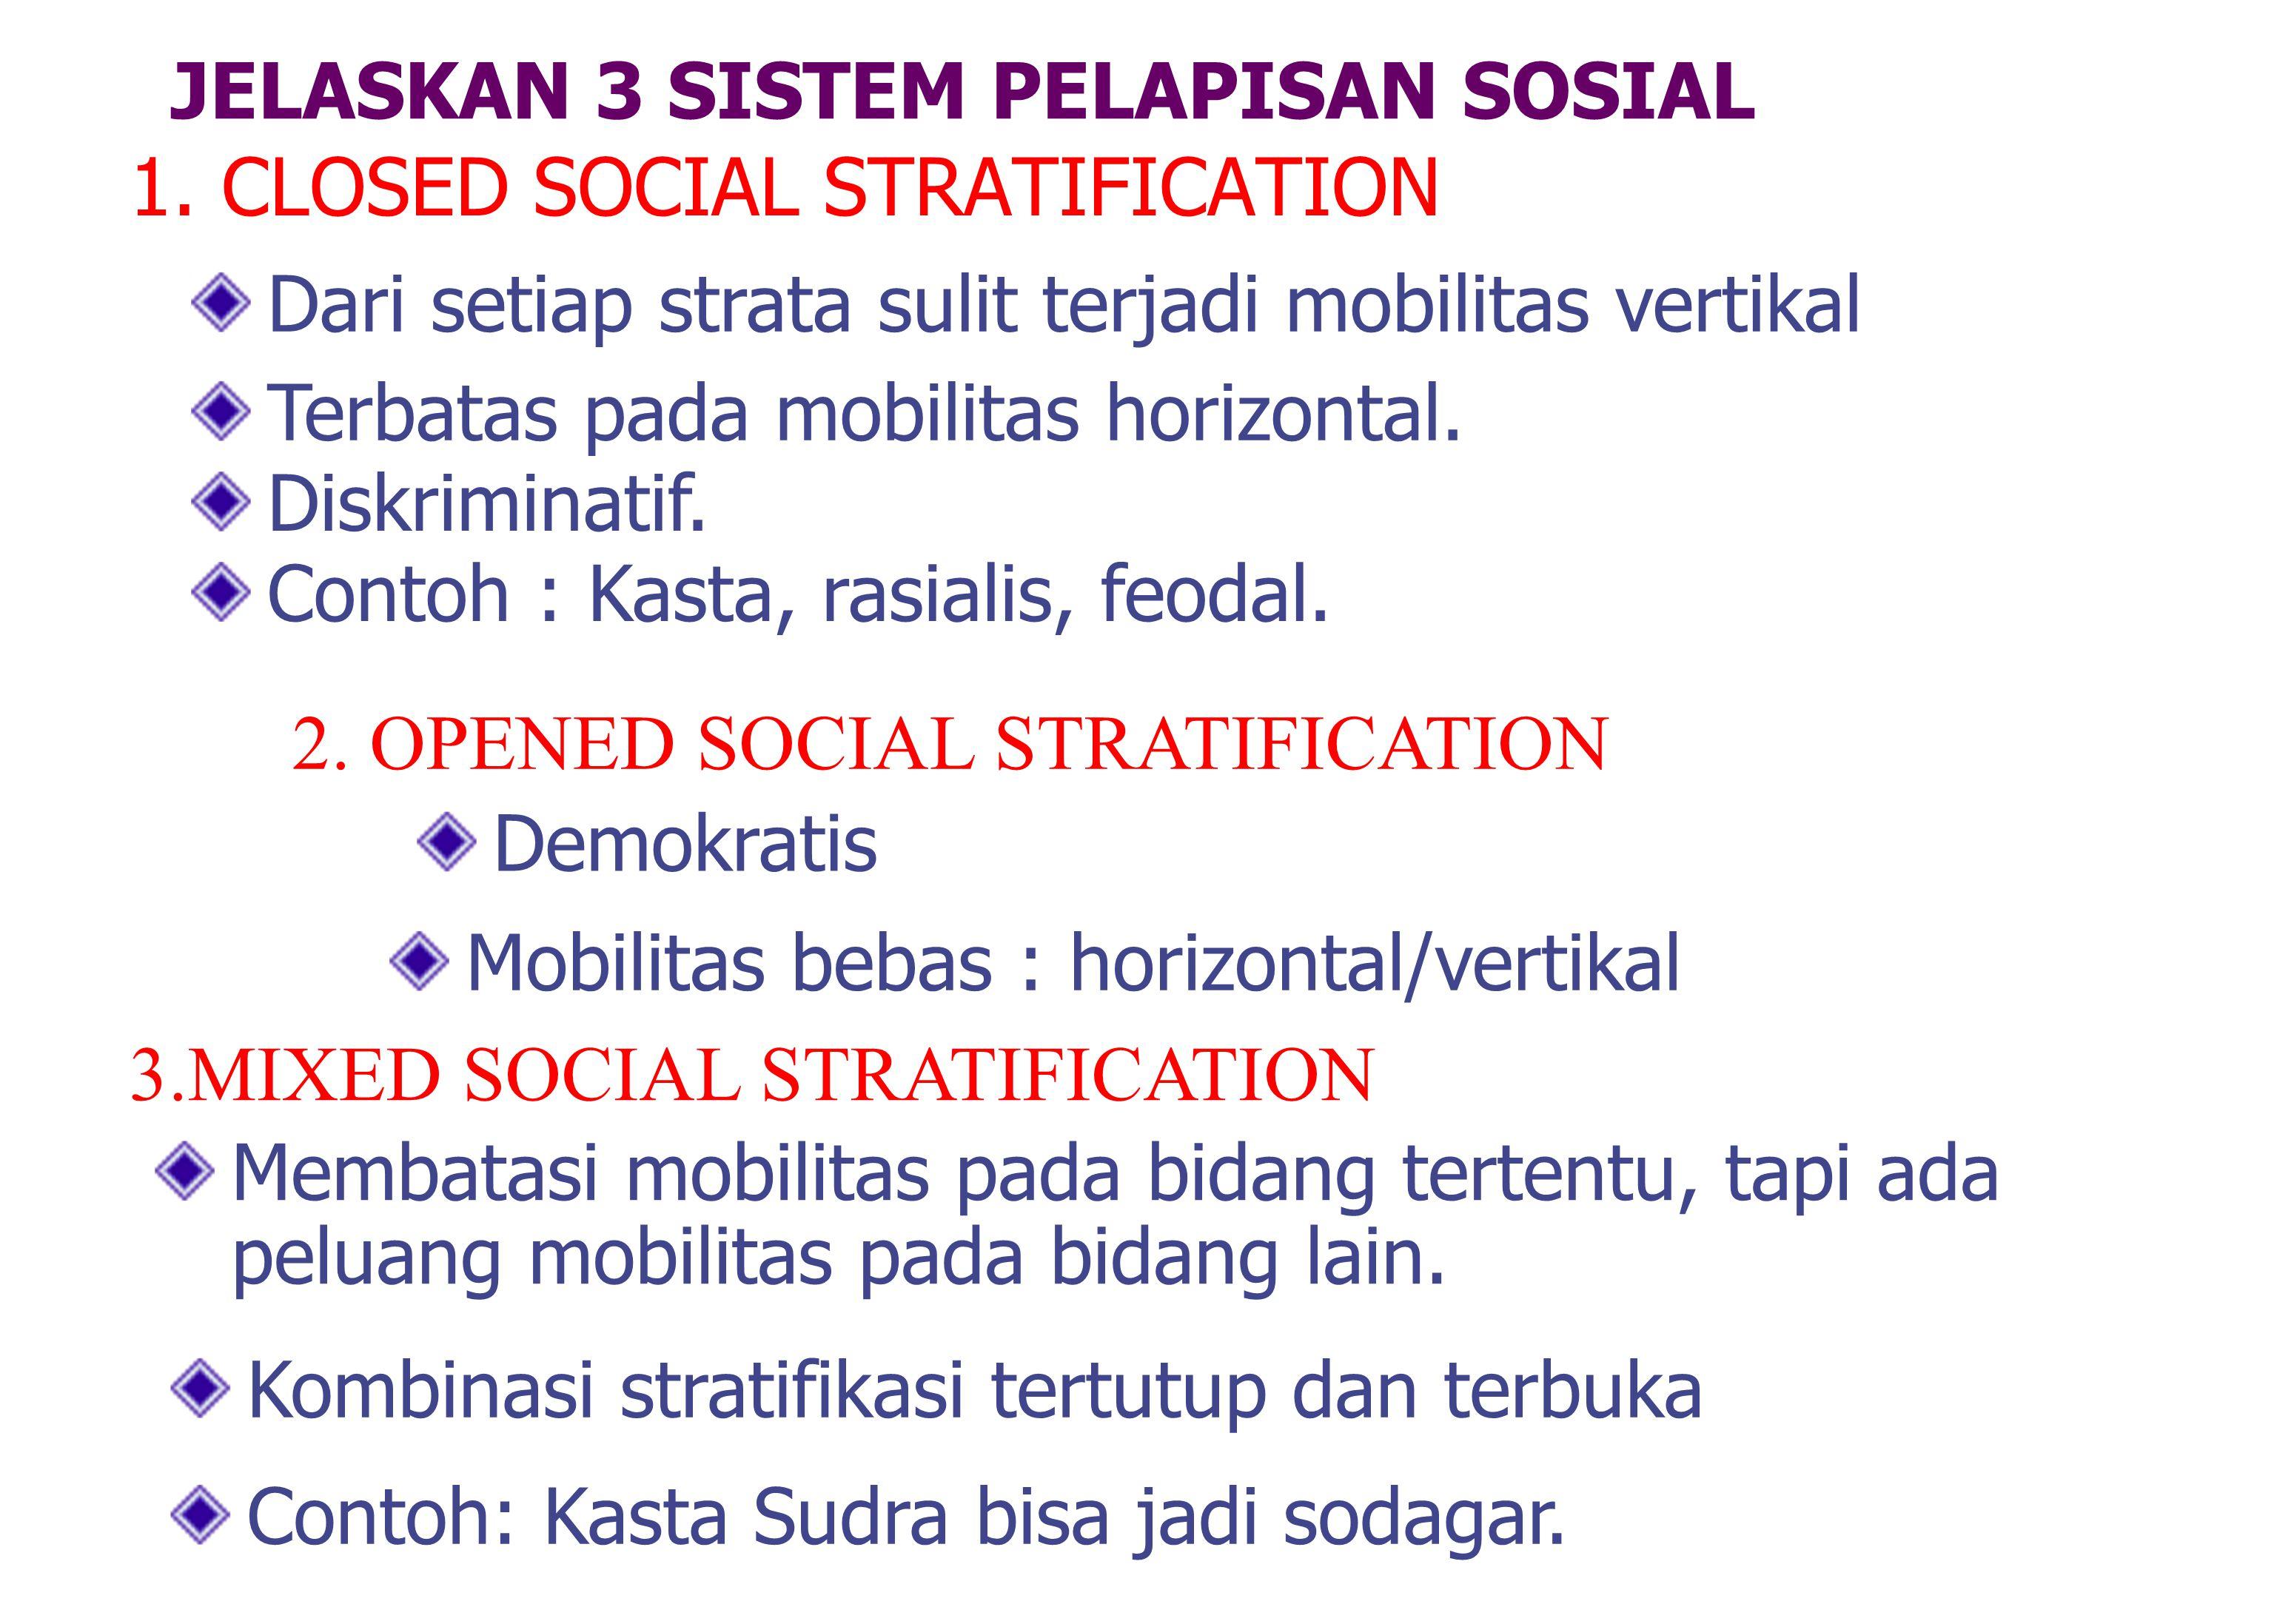 JELASKAN 3 SISTEM PELAPISAN SOSIAL 1.CLOSED SOCIAL STRATIFICATION 2.